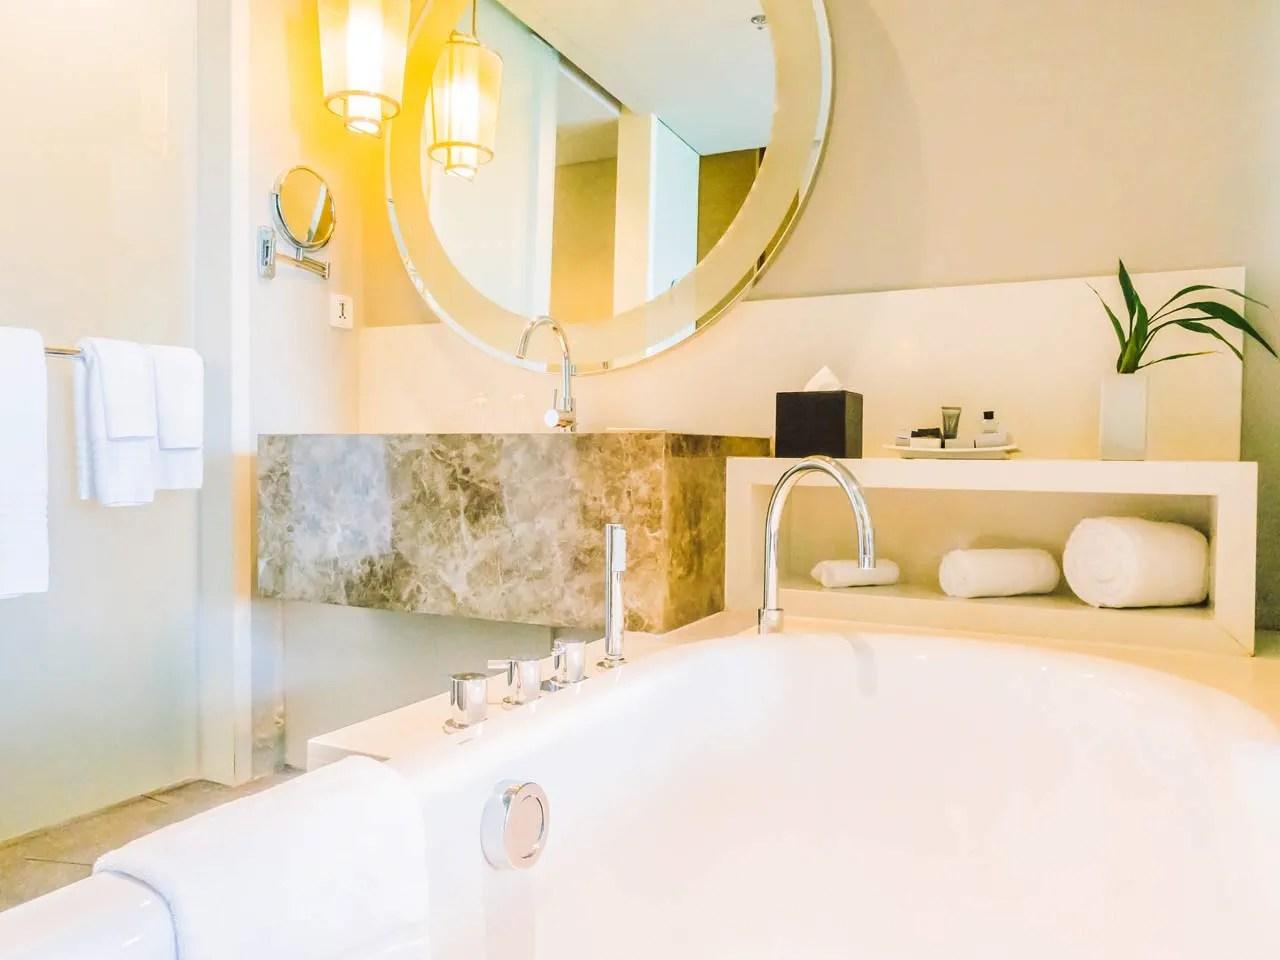 Big ideas for a small bathroom - Saga on Small Bathroom Ideas Uk id=48664